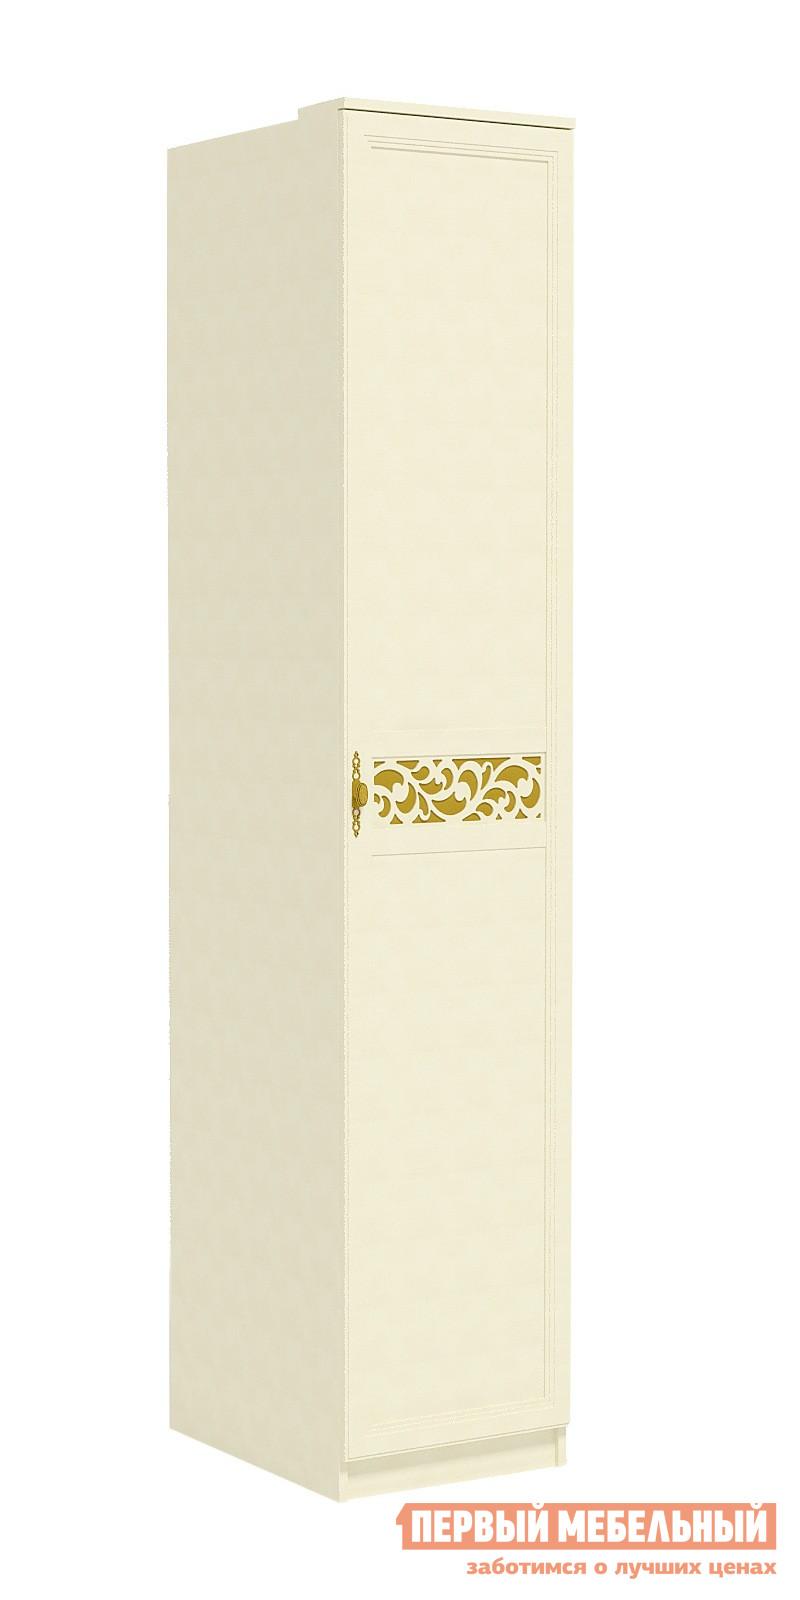 Шкаф распашной ТД Арника Л6 adidas squat rack adbe 10265